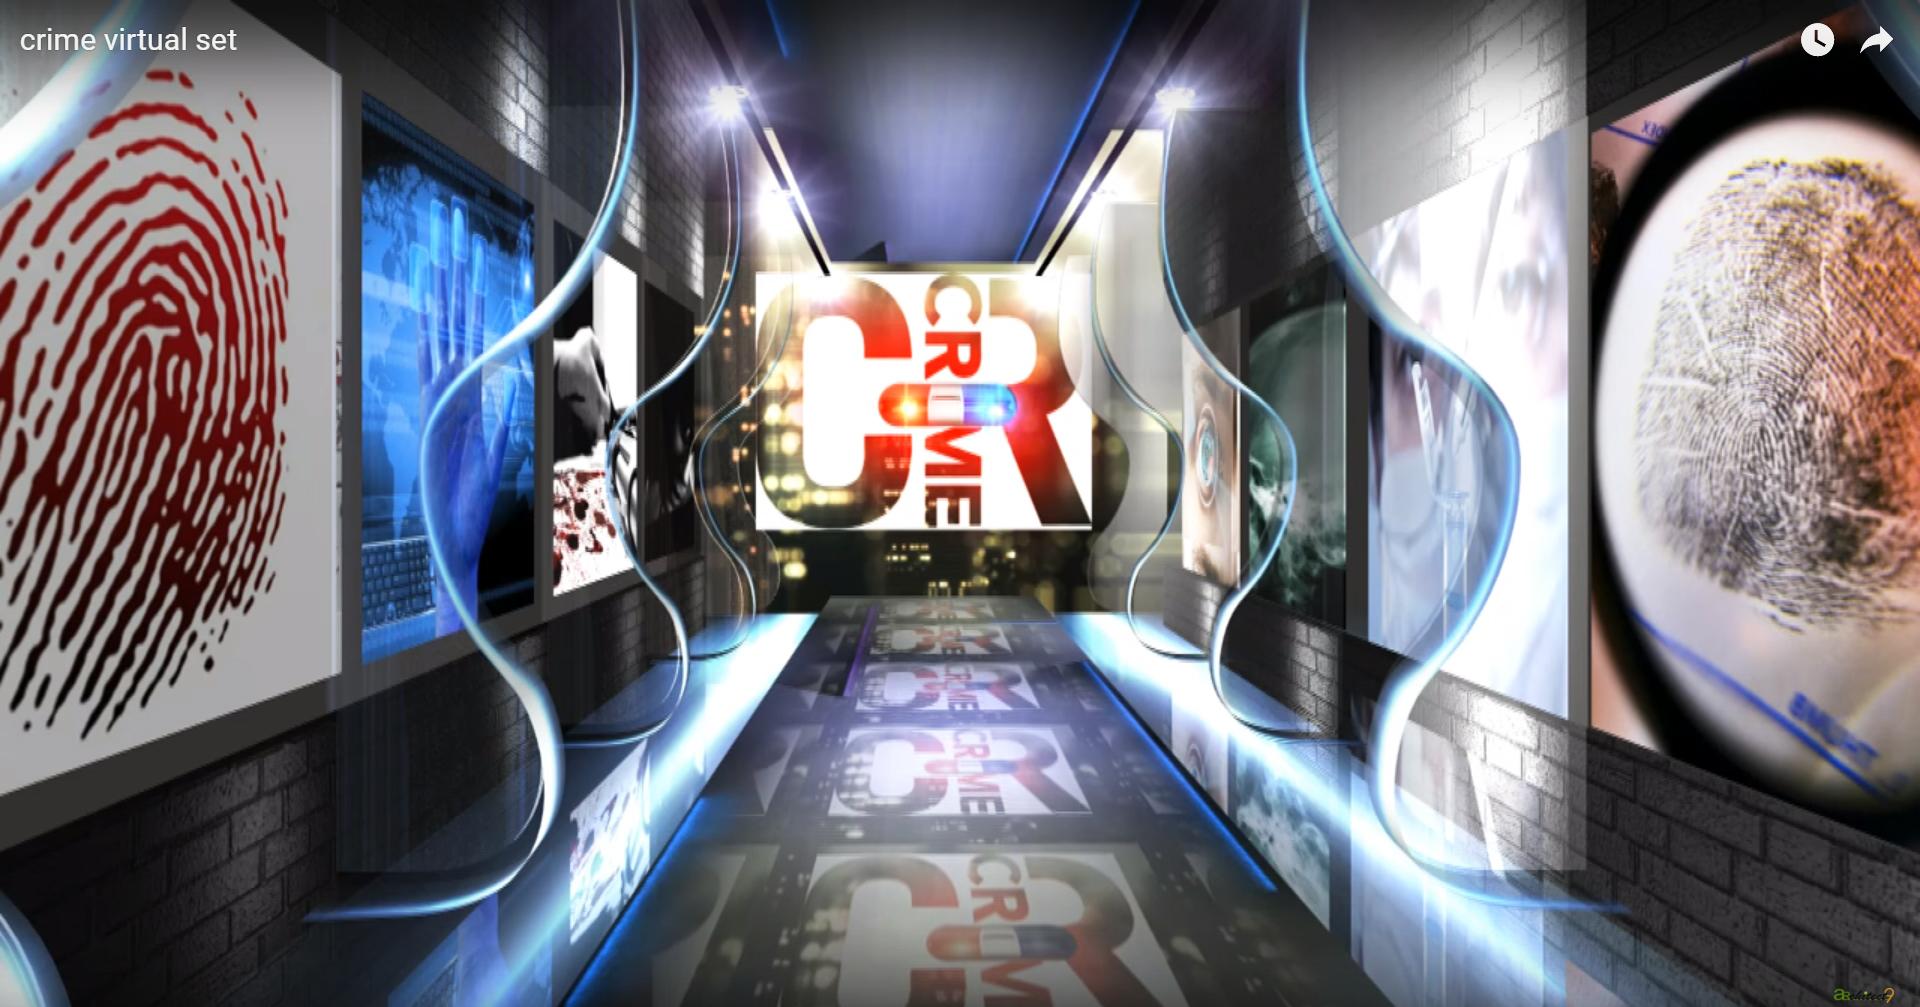 crime virtual set